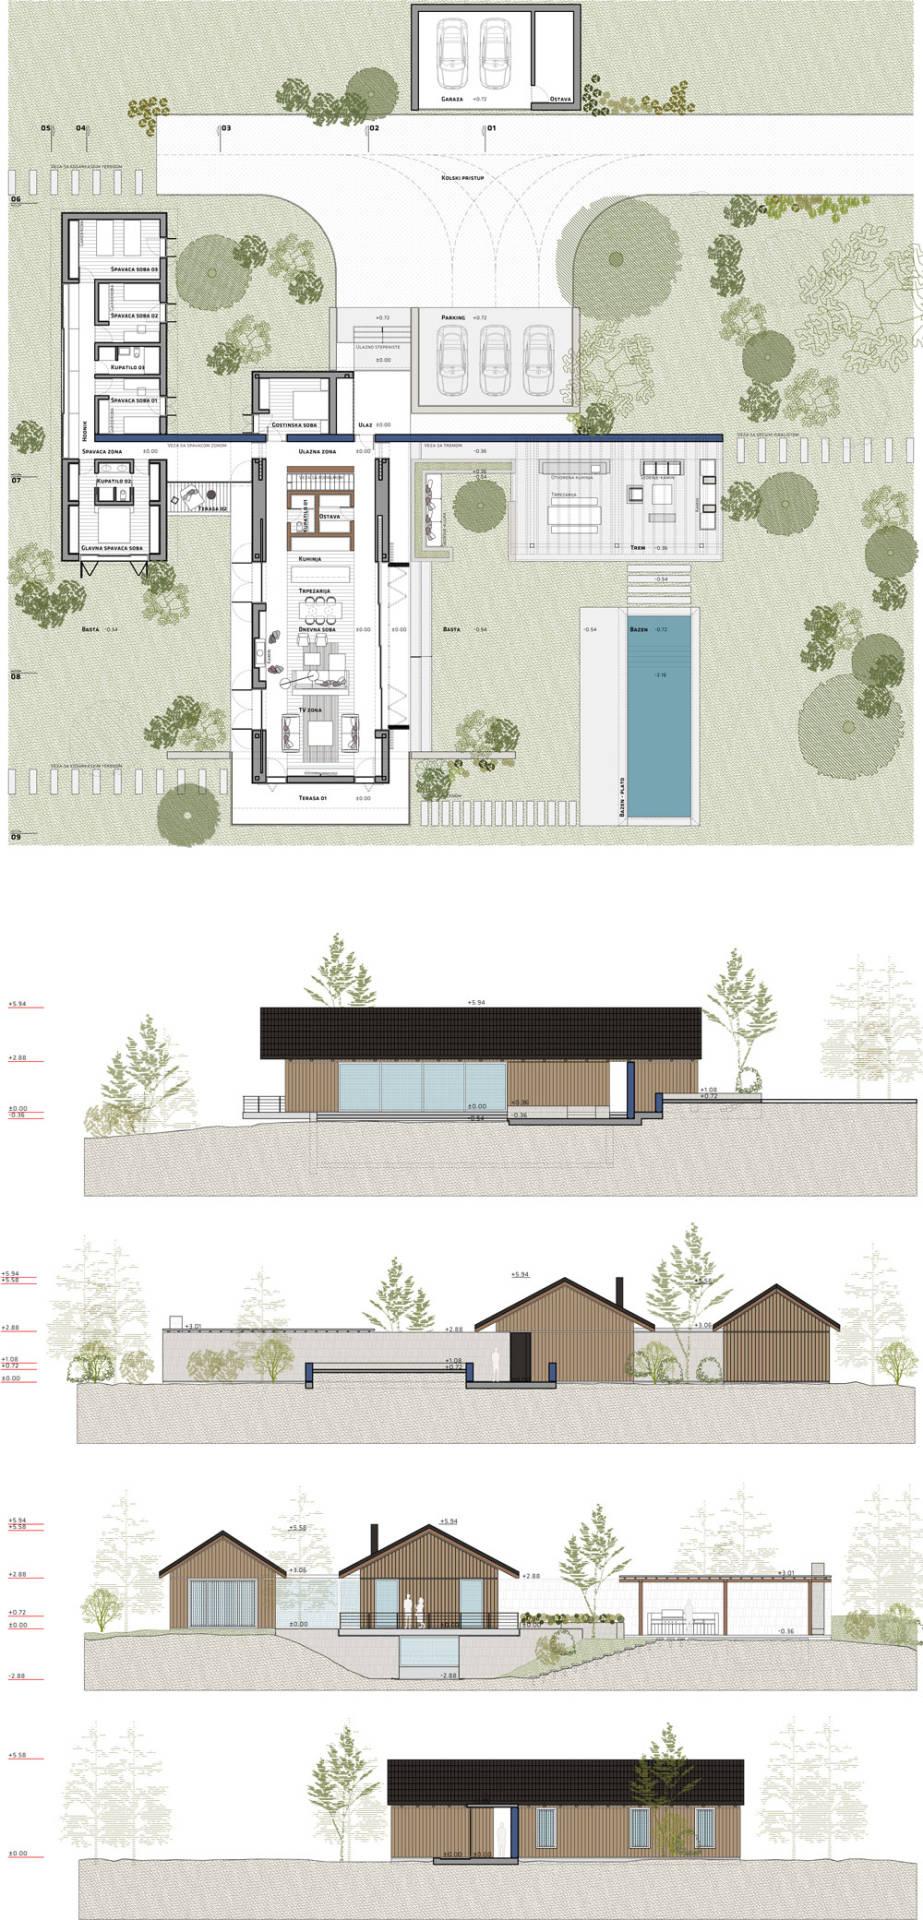 mv-house-drawing-02